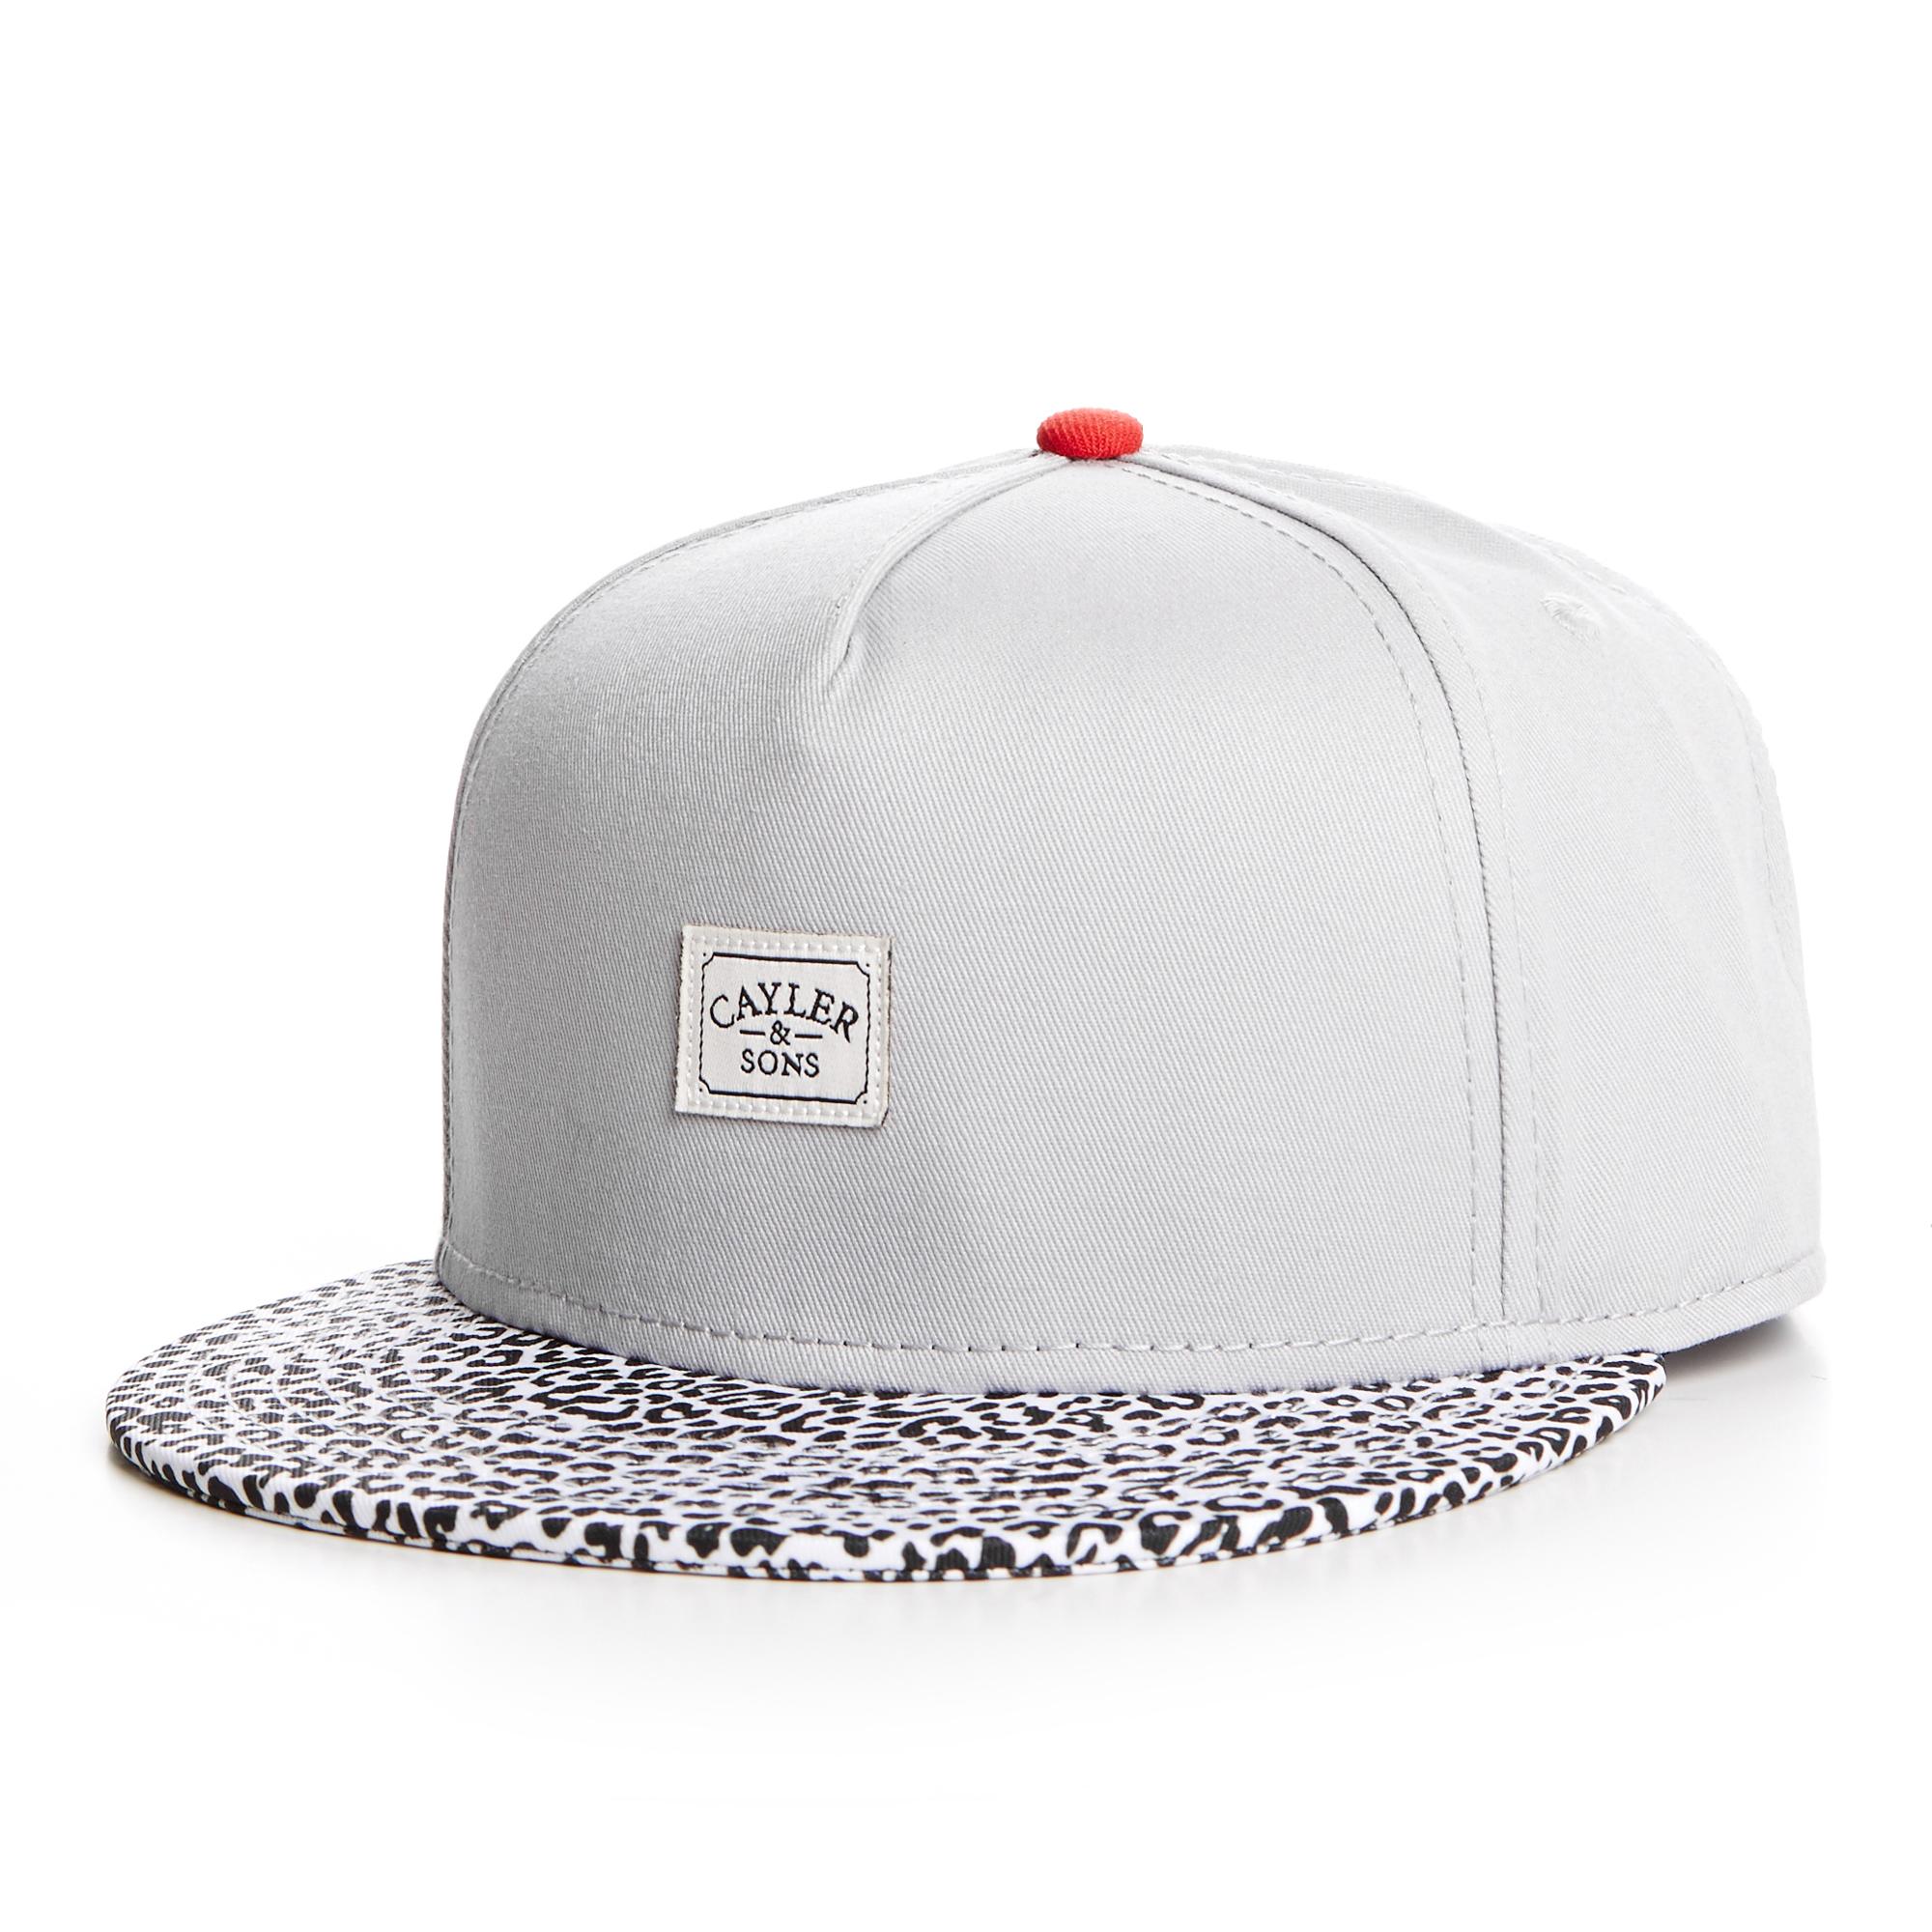 2-tone-micro-leo-cap-grey-white-012